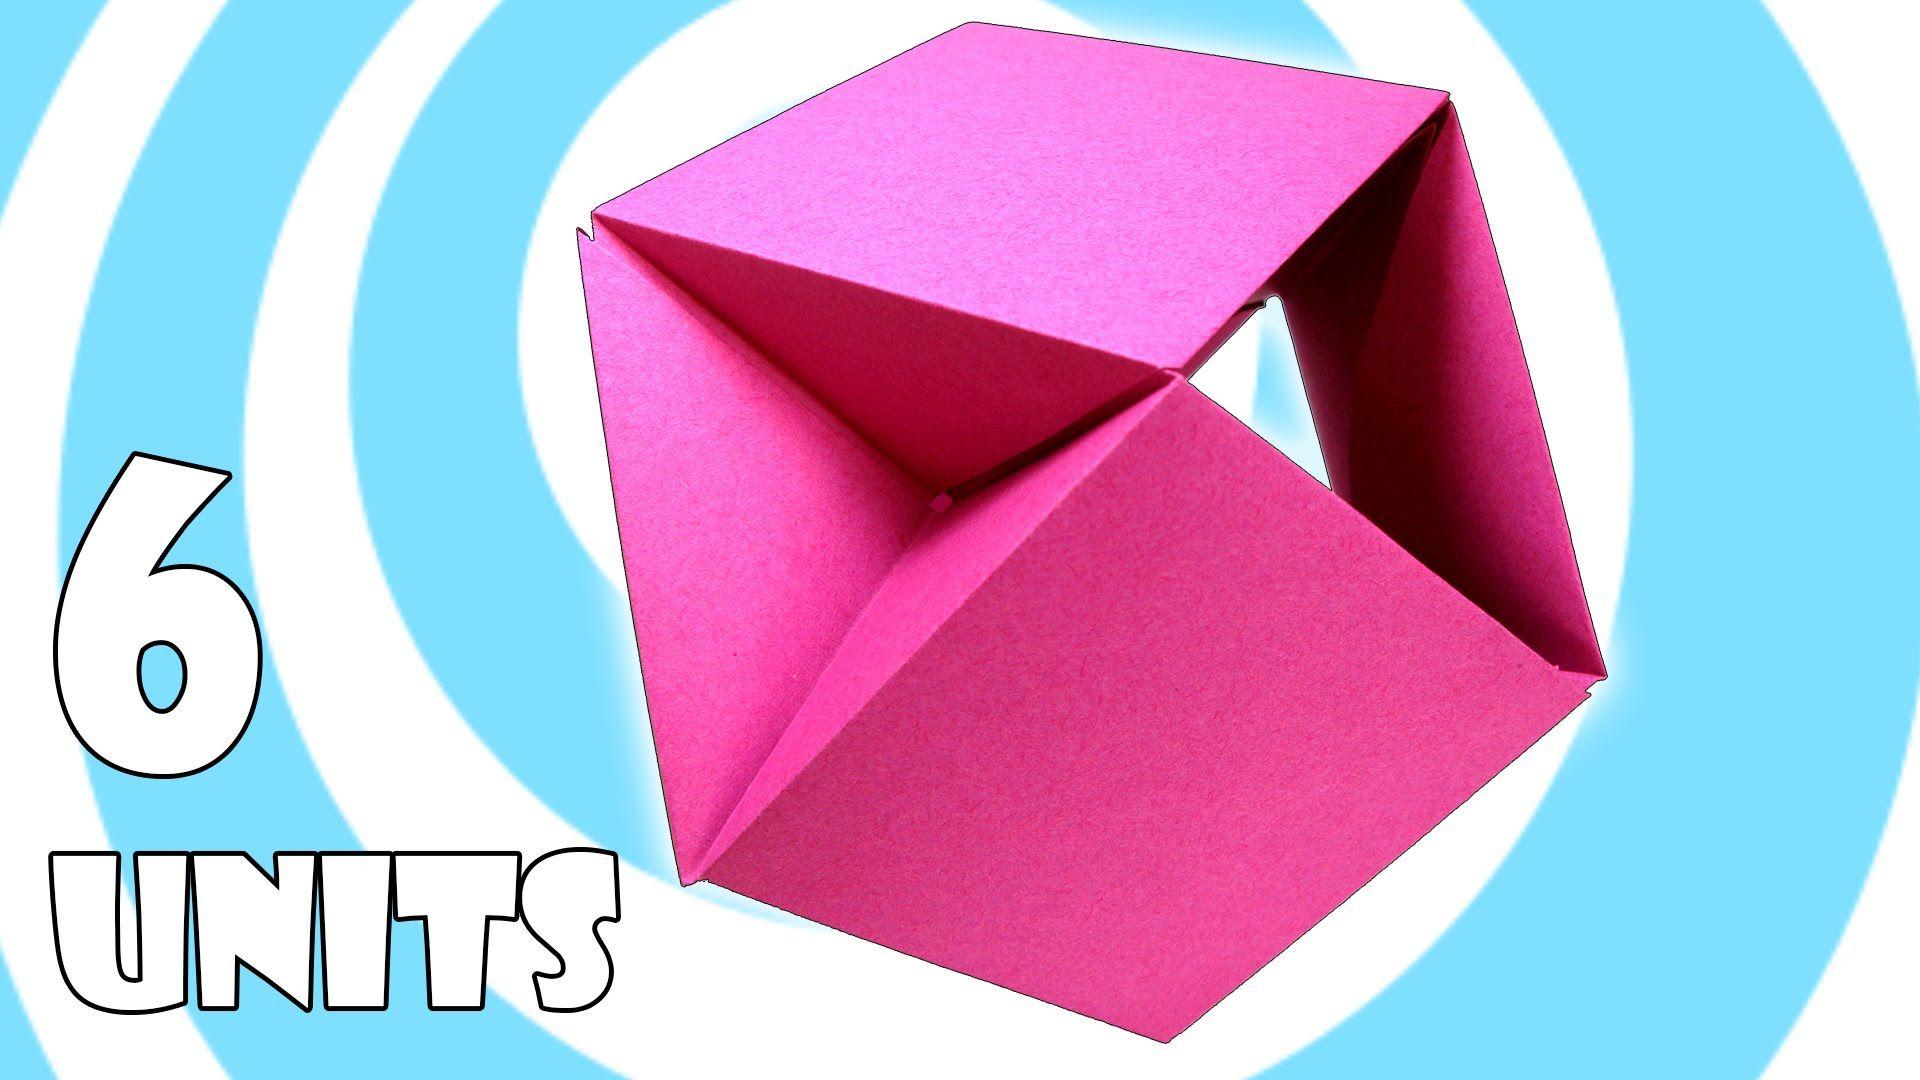 Modular Origami Ball Tutorial  6 Units   Tomoko Fuse